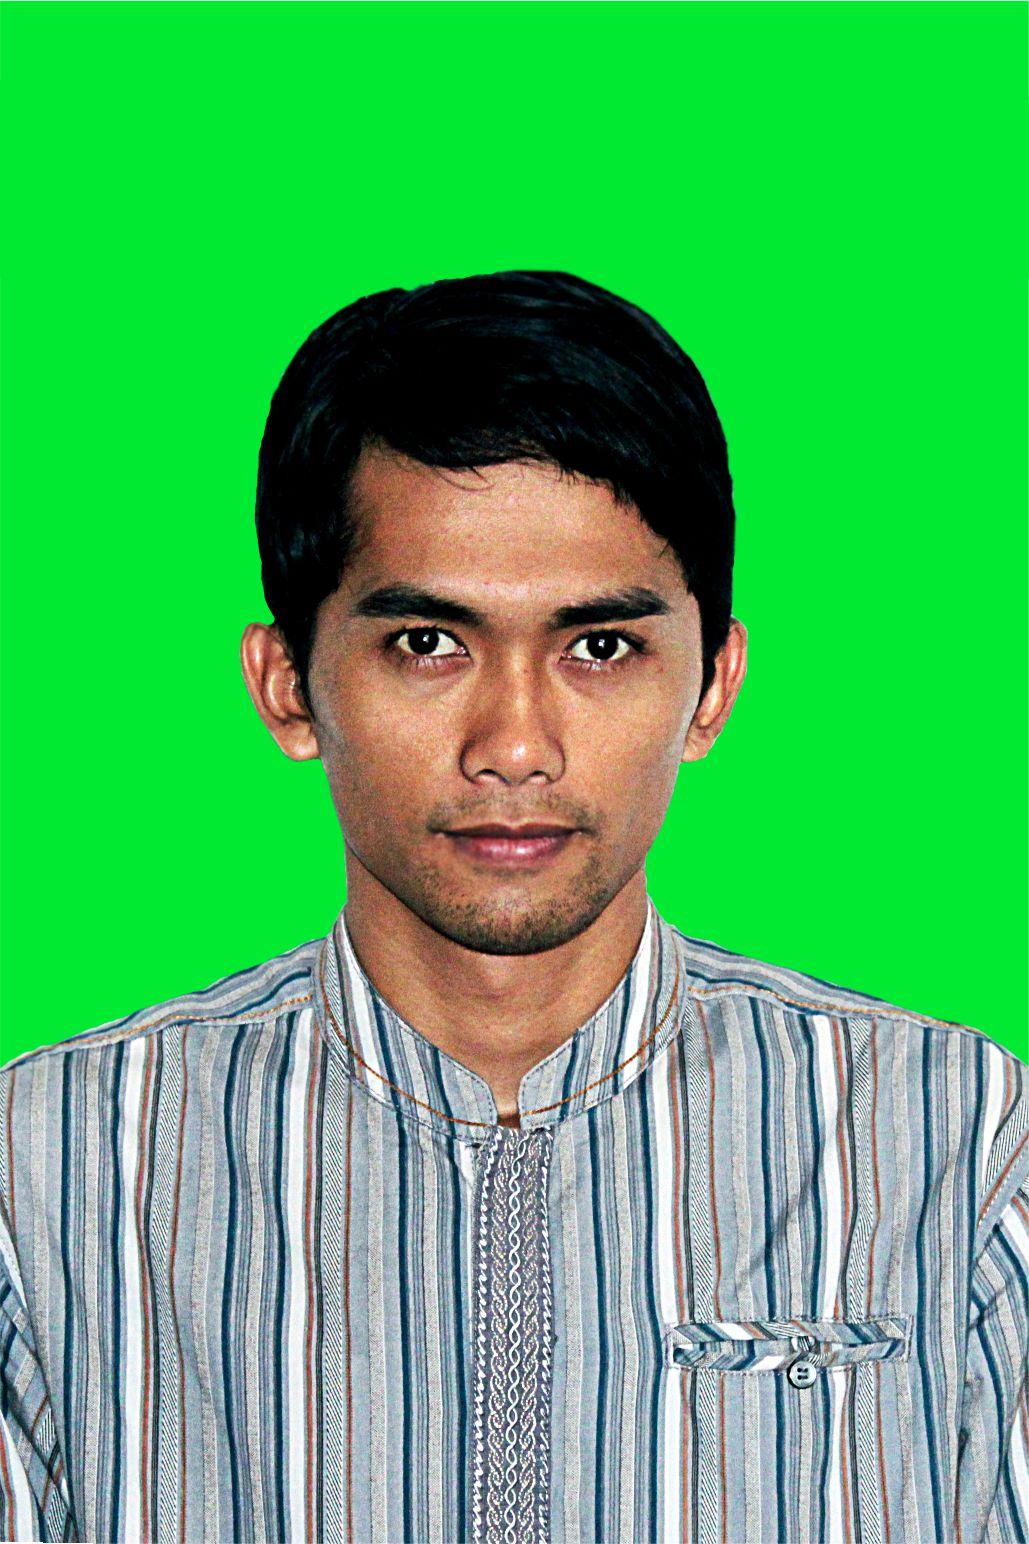 Staff Hizbul Arafat SMK Taruna Harapan 1 Cipatat